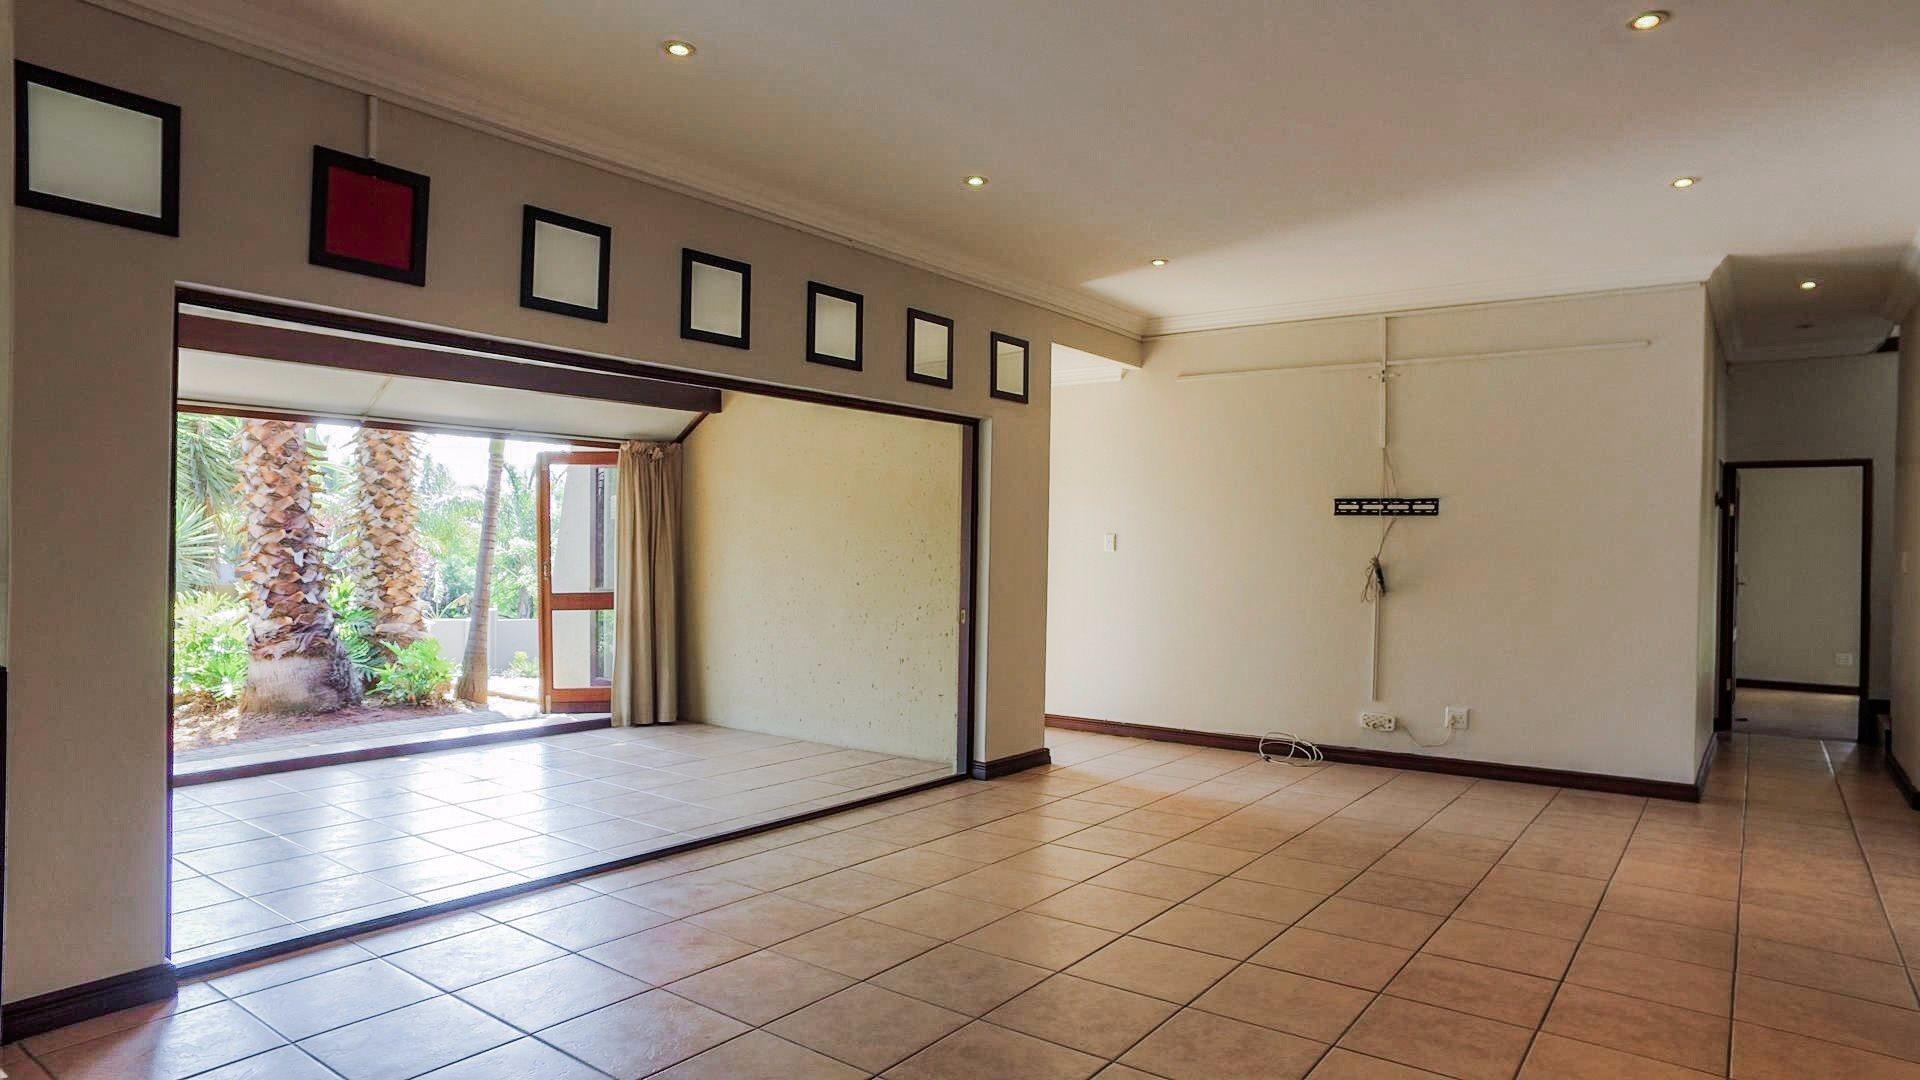 Irene View Estate property for sale. Ref No: 13519995. Picture no 6